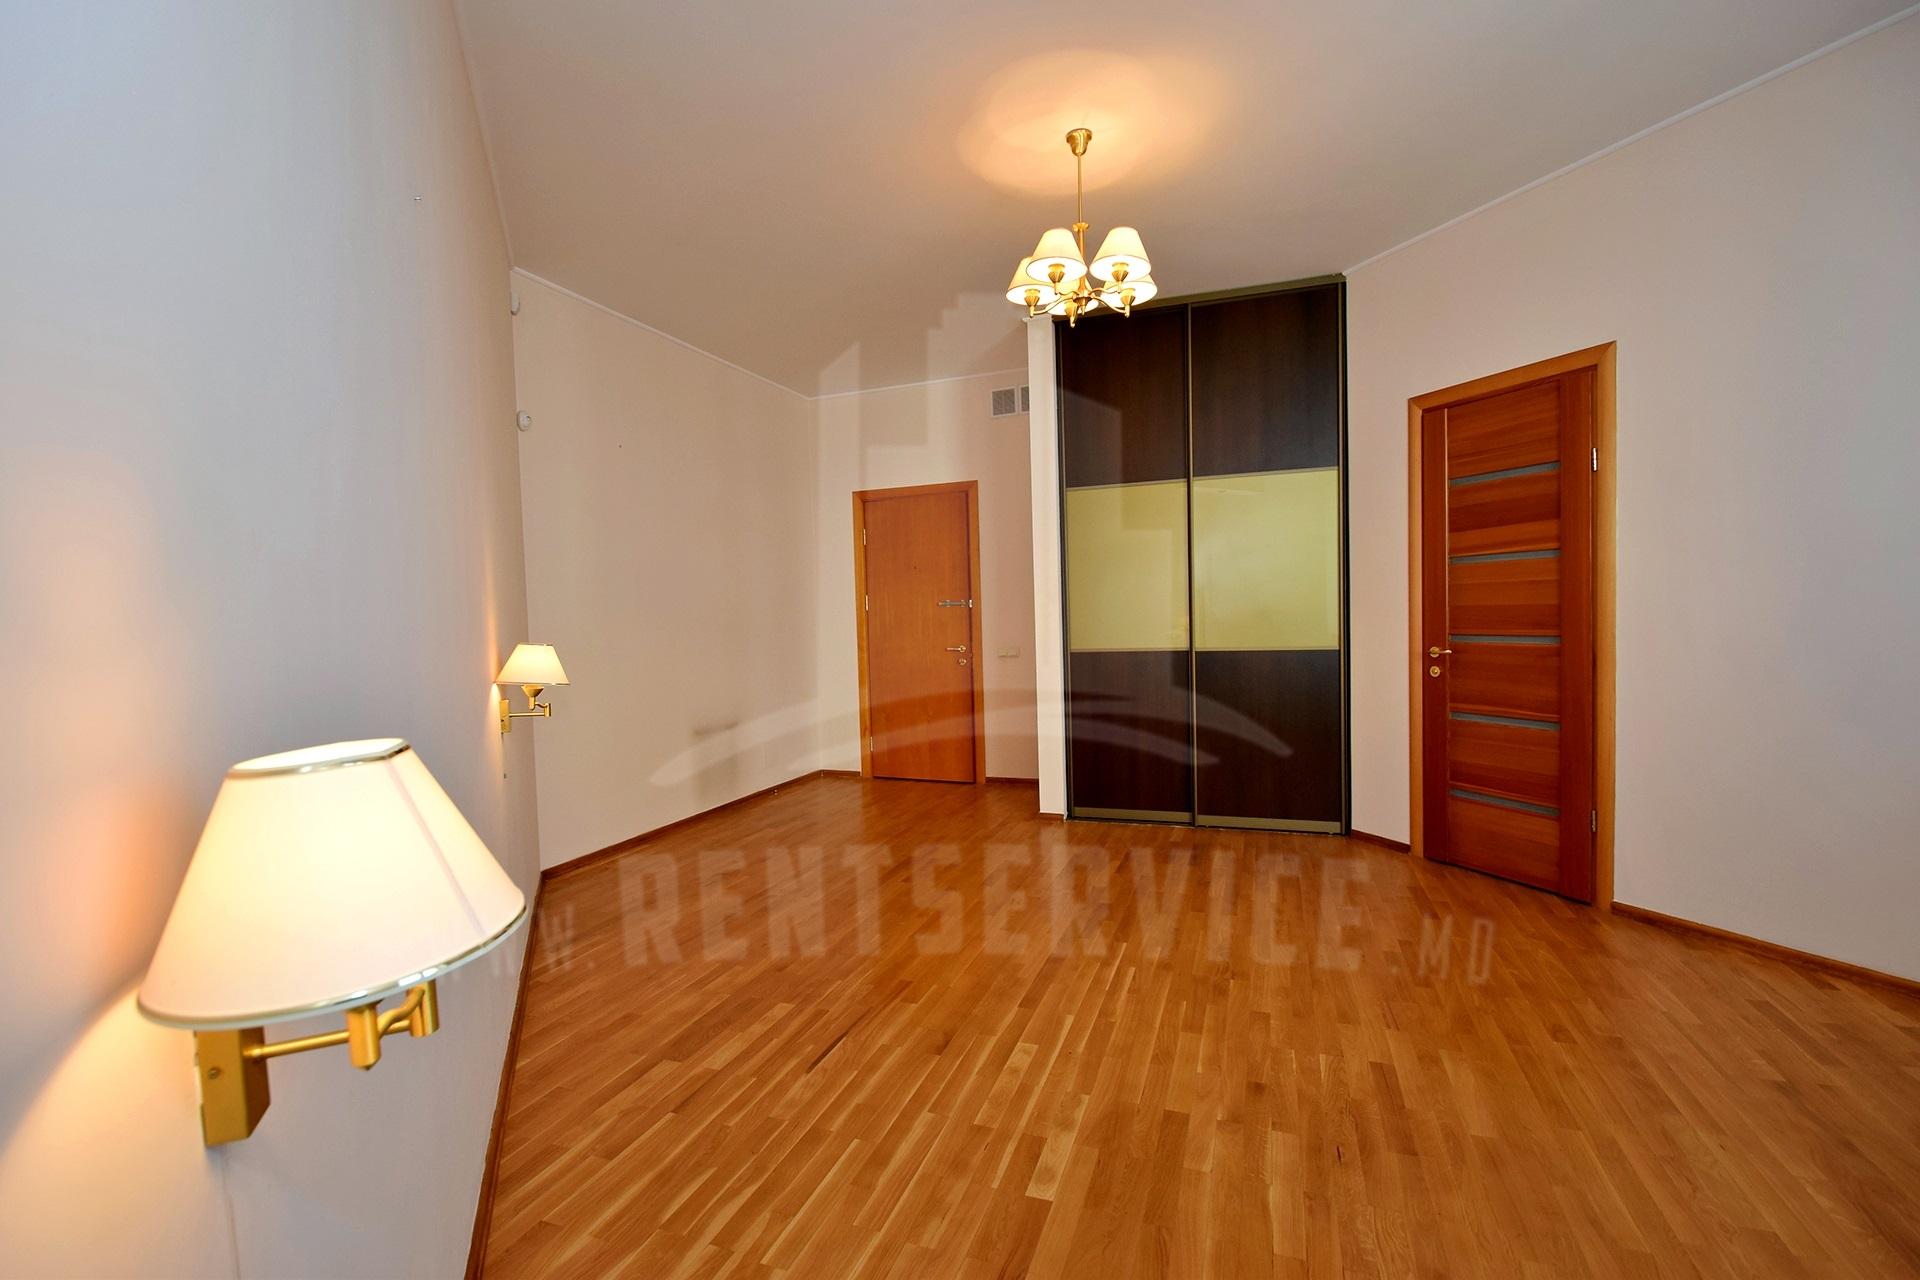 269_apartment_8.jpg